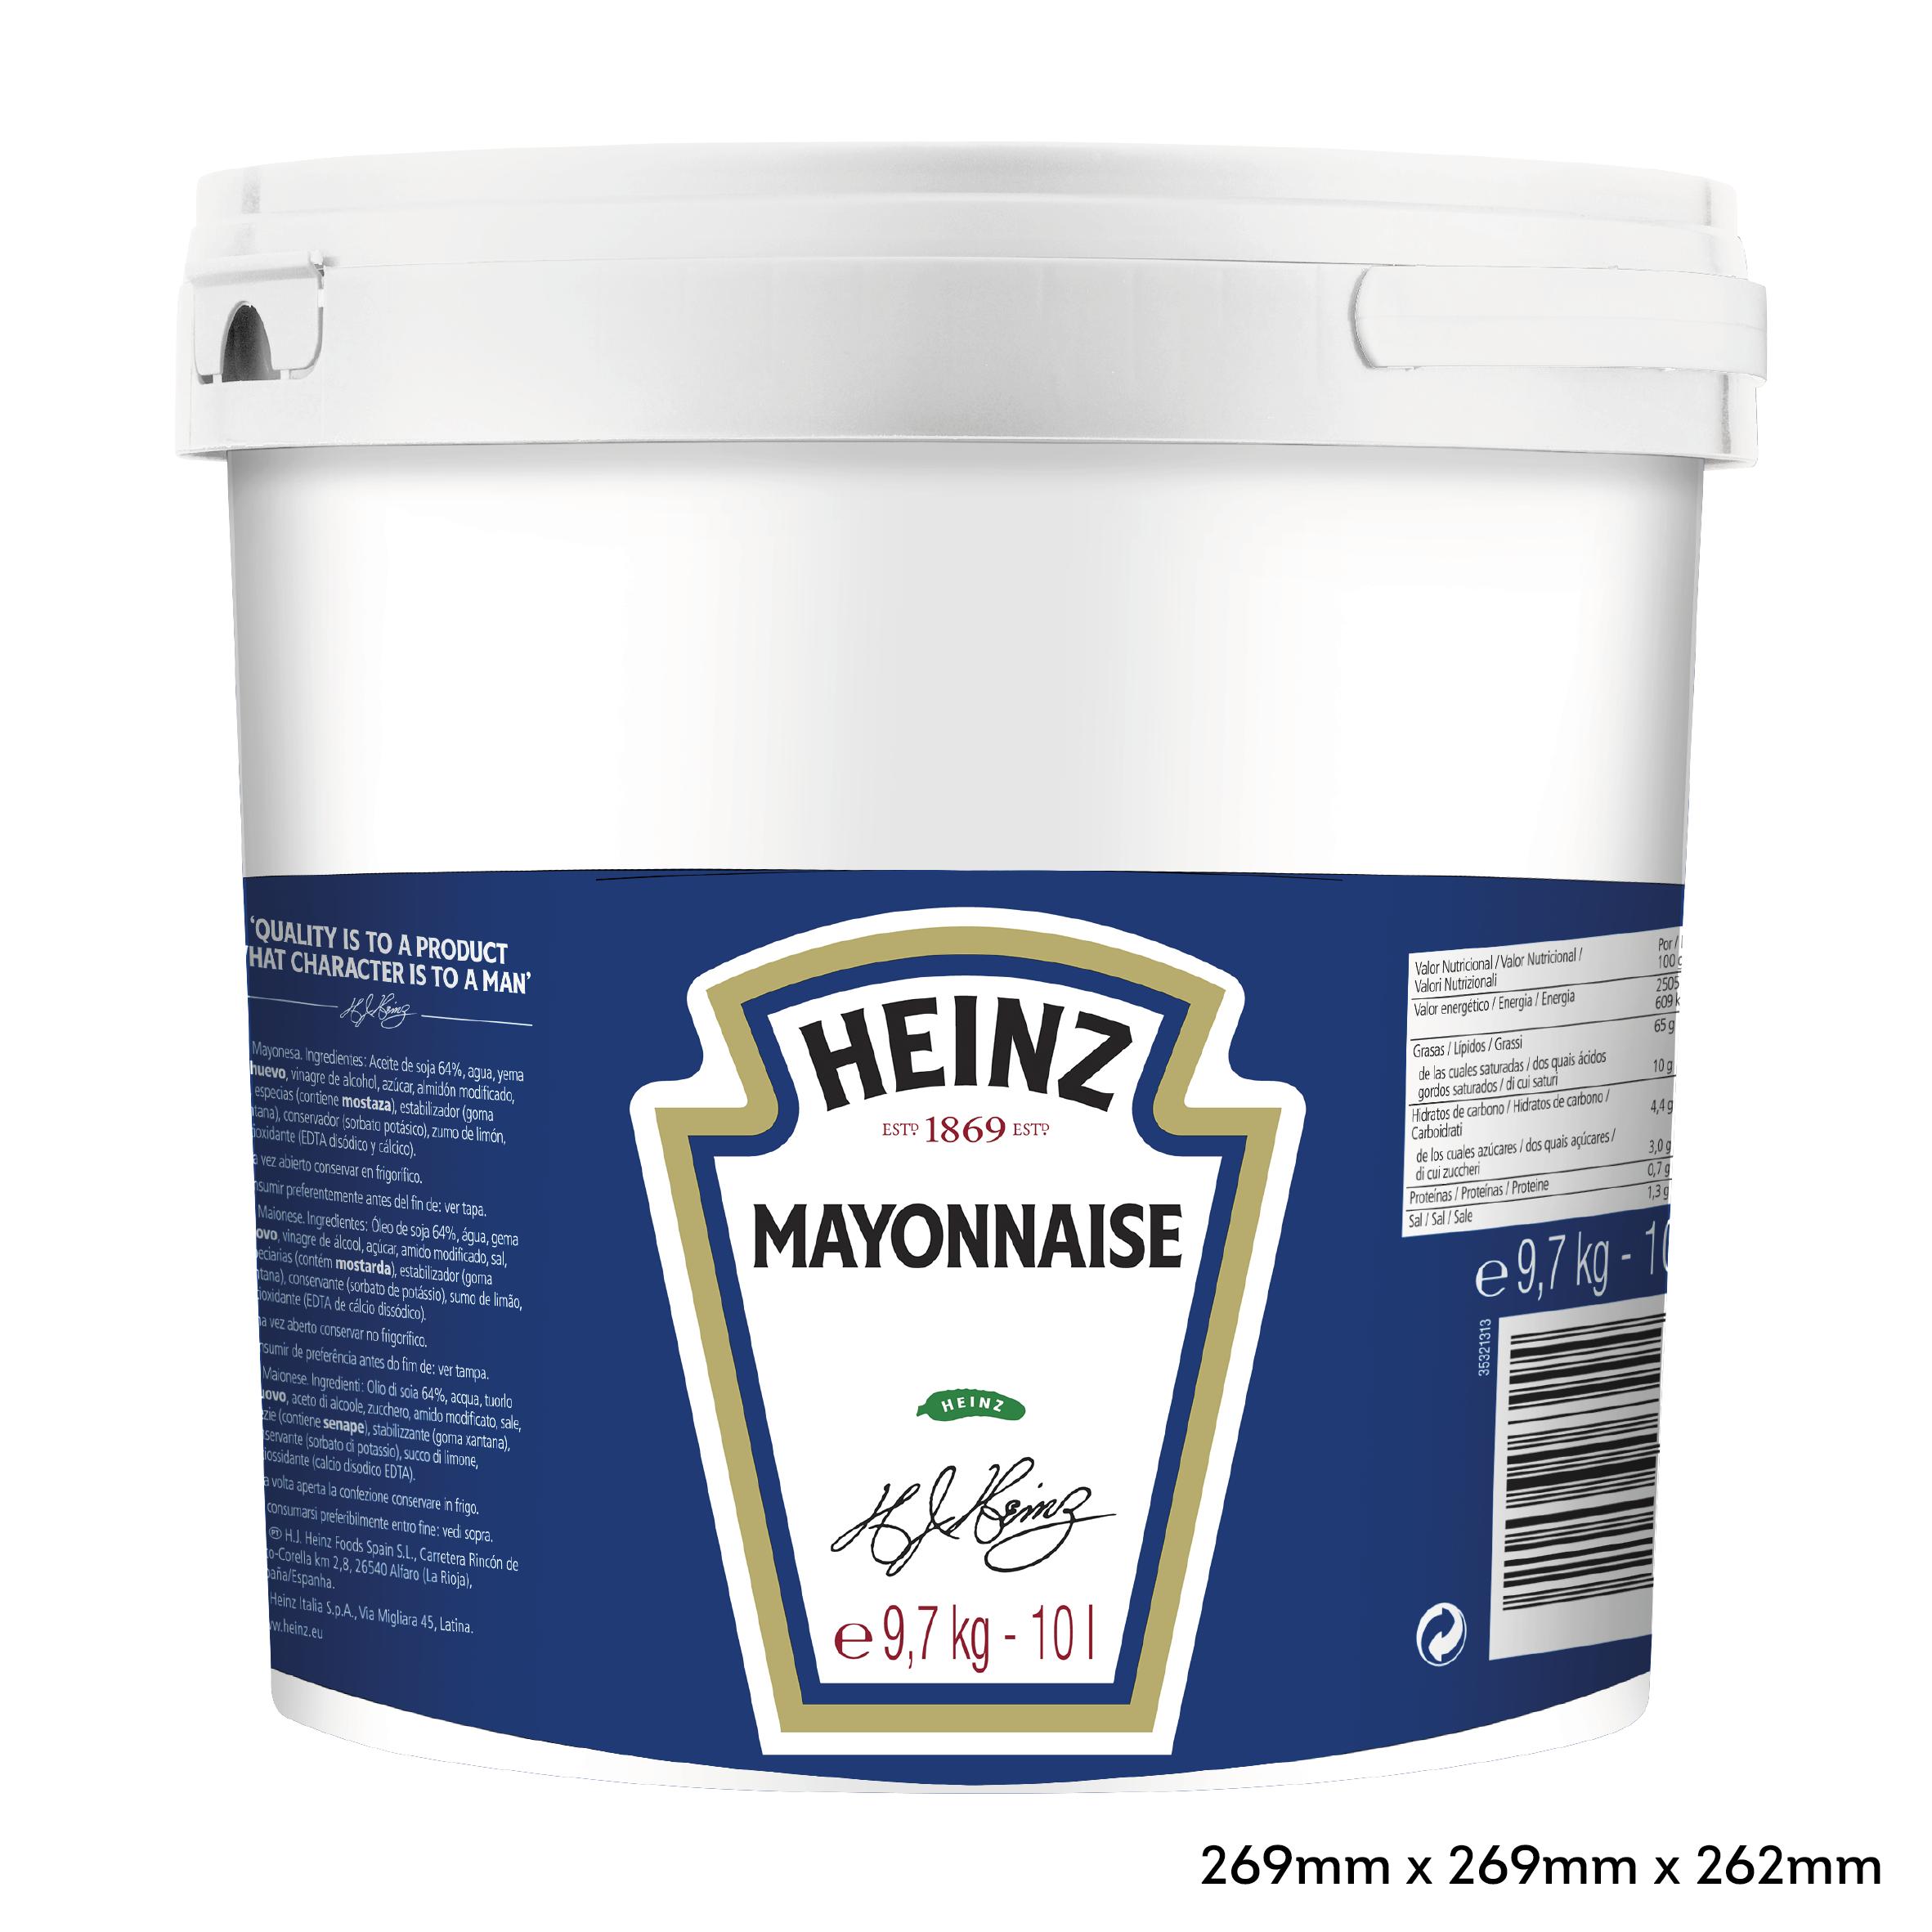 Heinz Mayonnaise 10L Pail